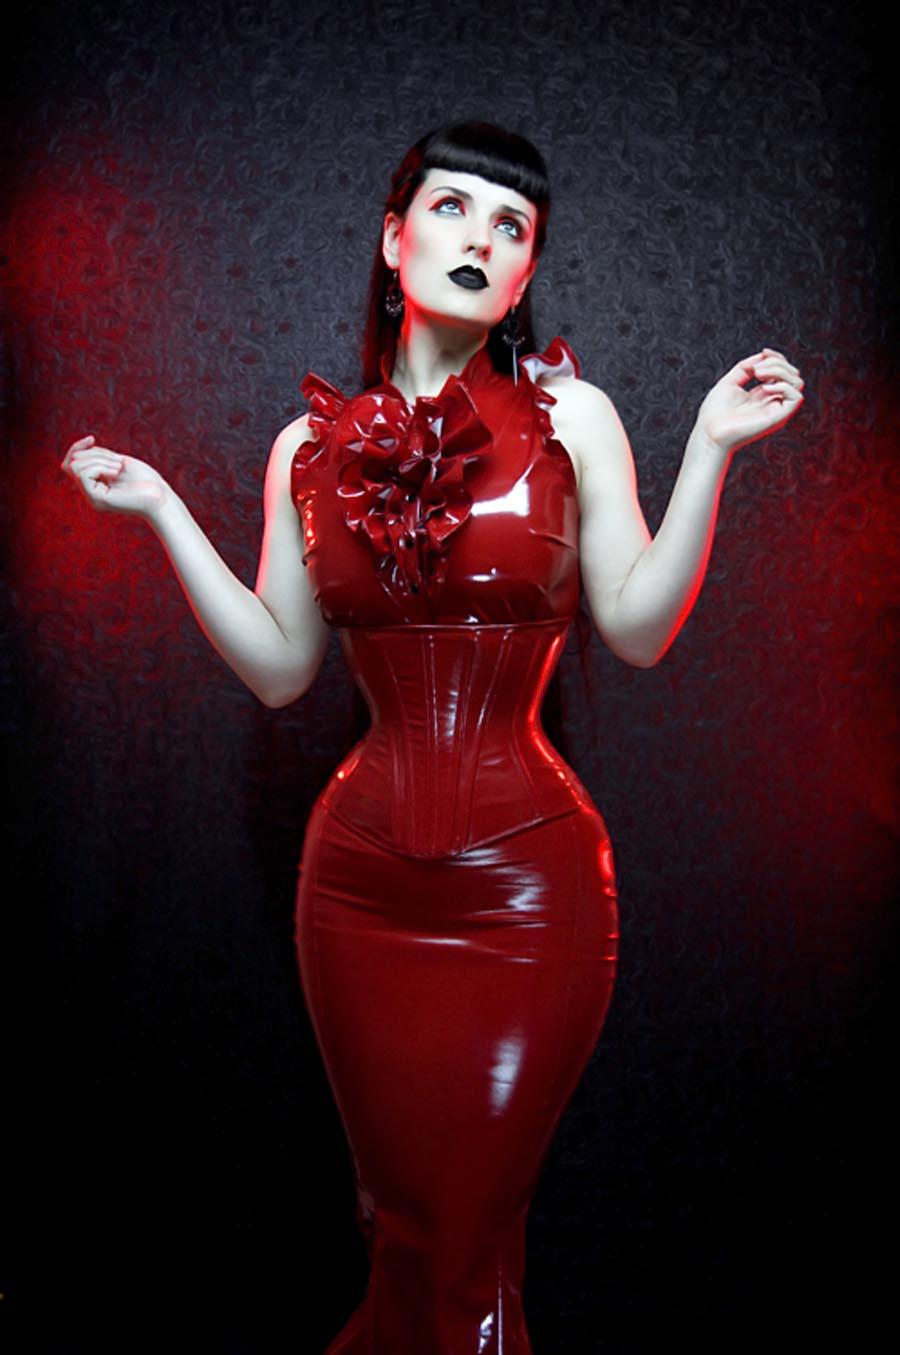 sexy+tight+corset+(45).jpg